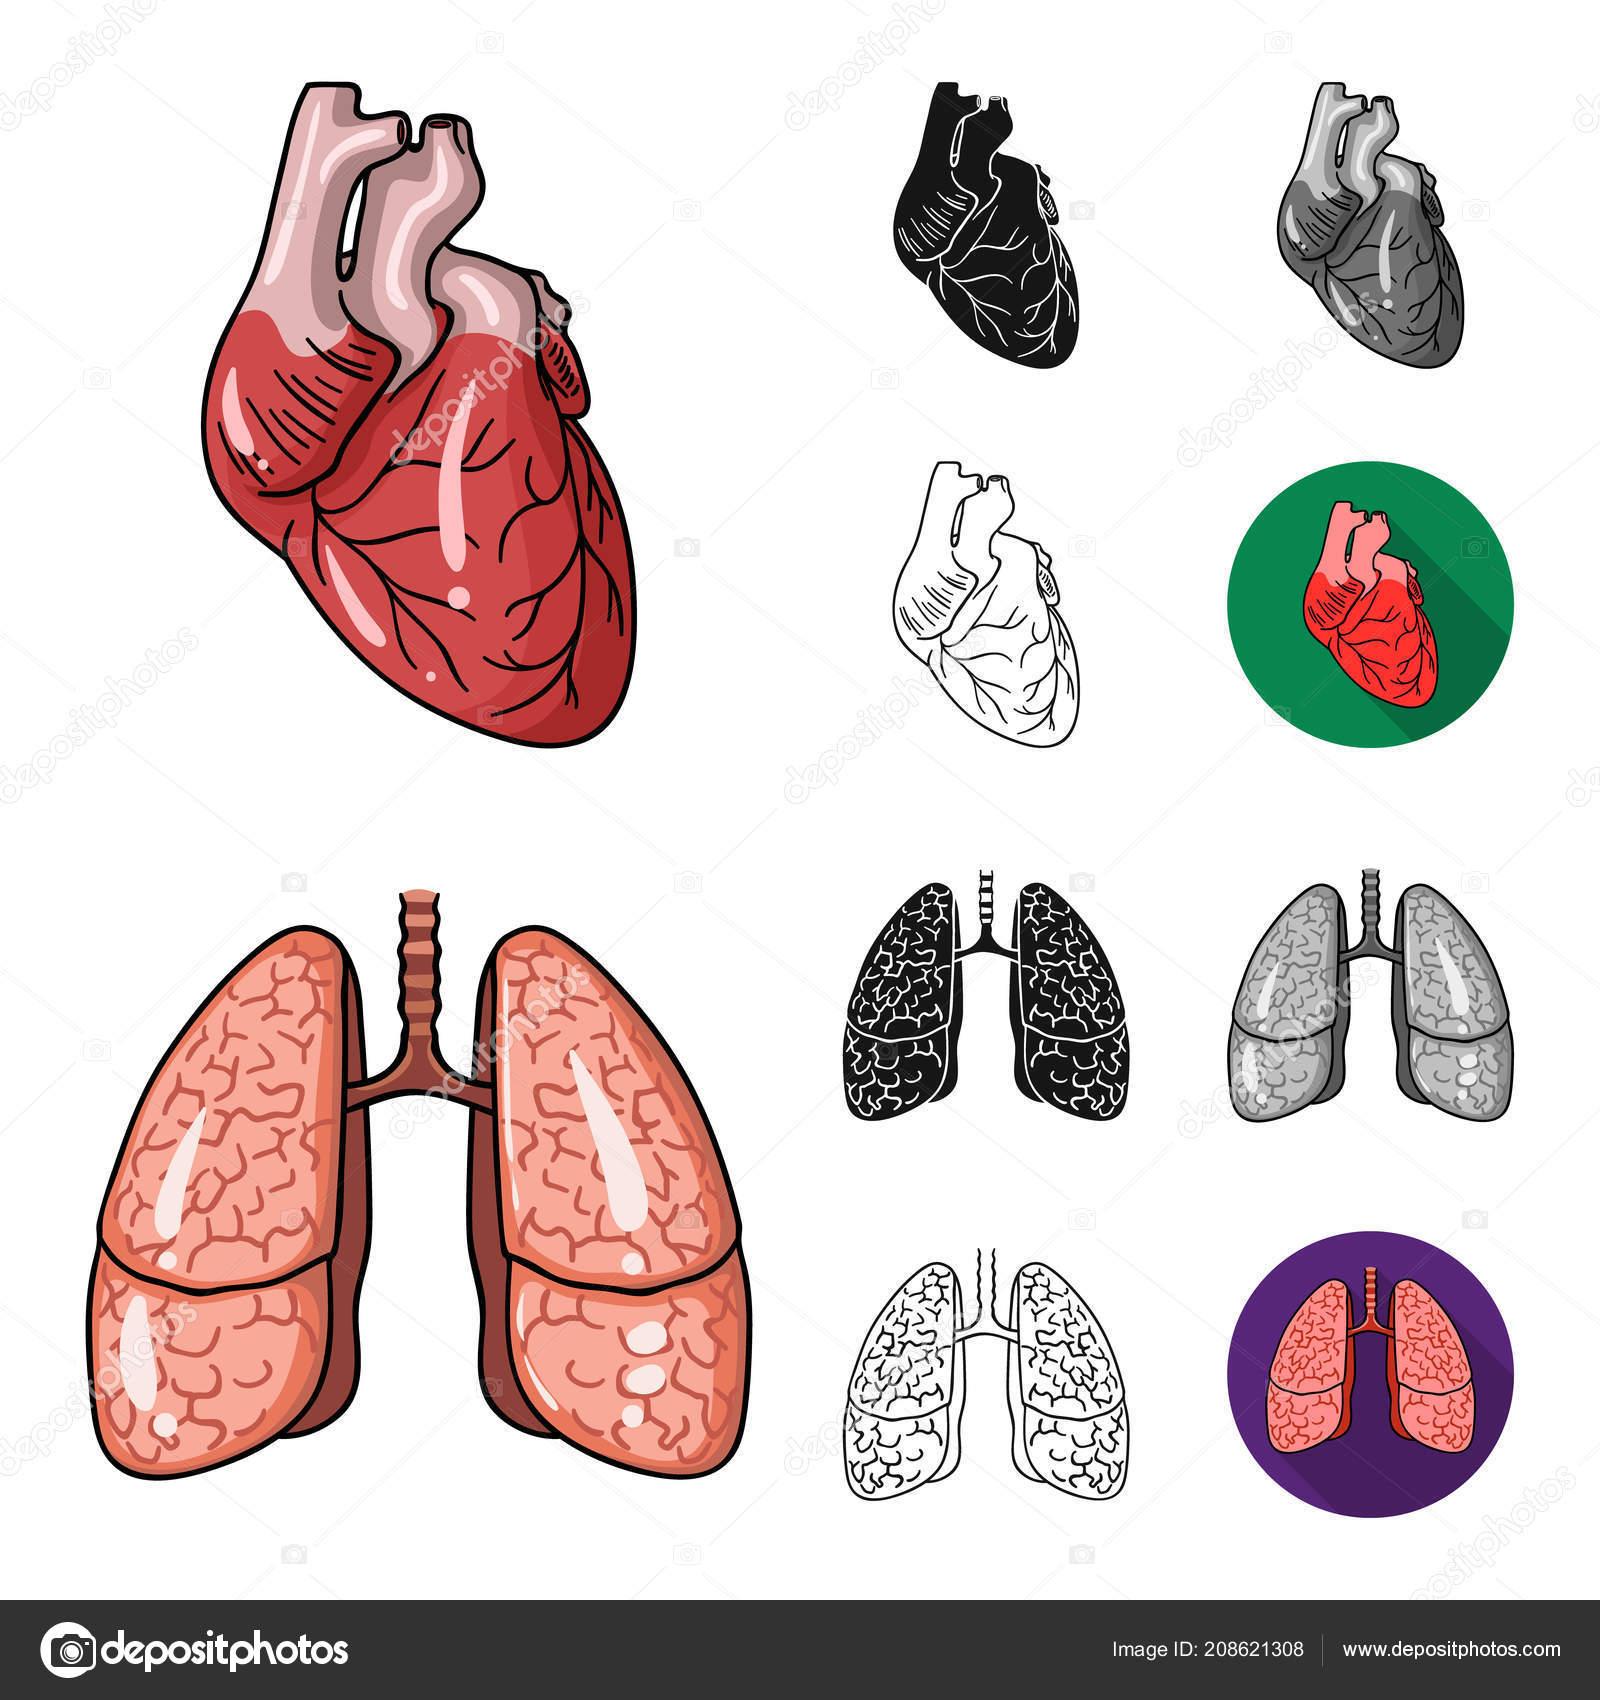 Human Organs Cartoonblackflatmonochromeoutline Icons In Set